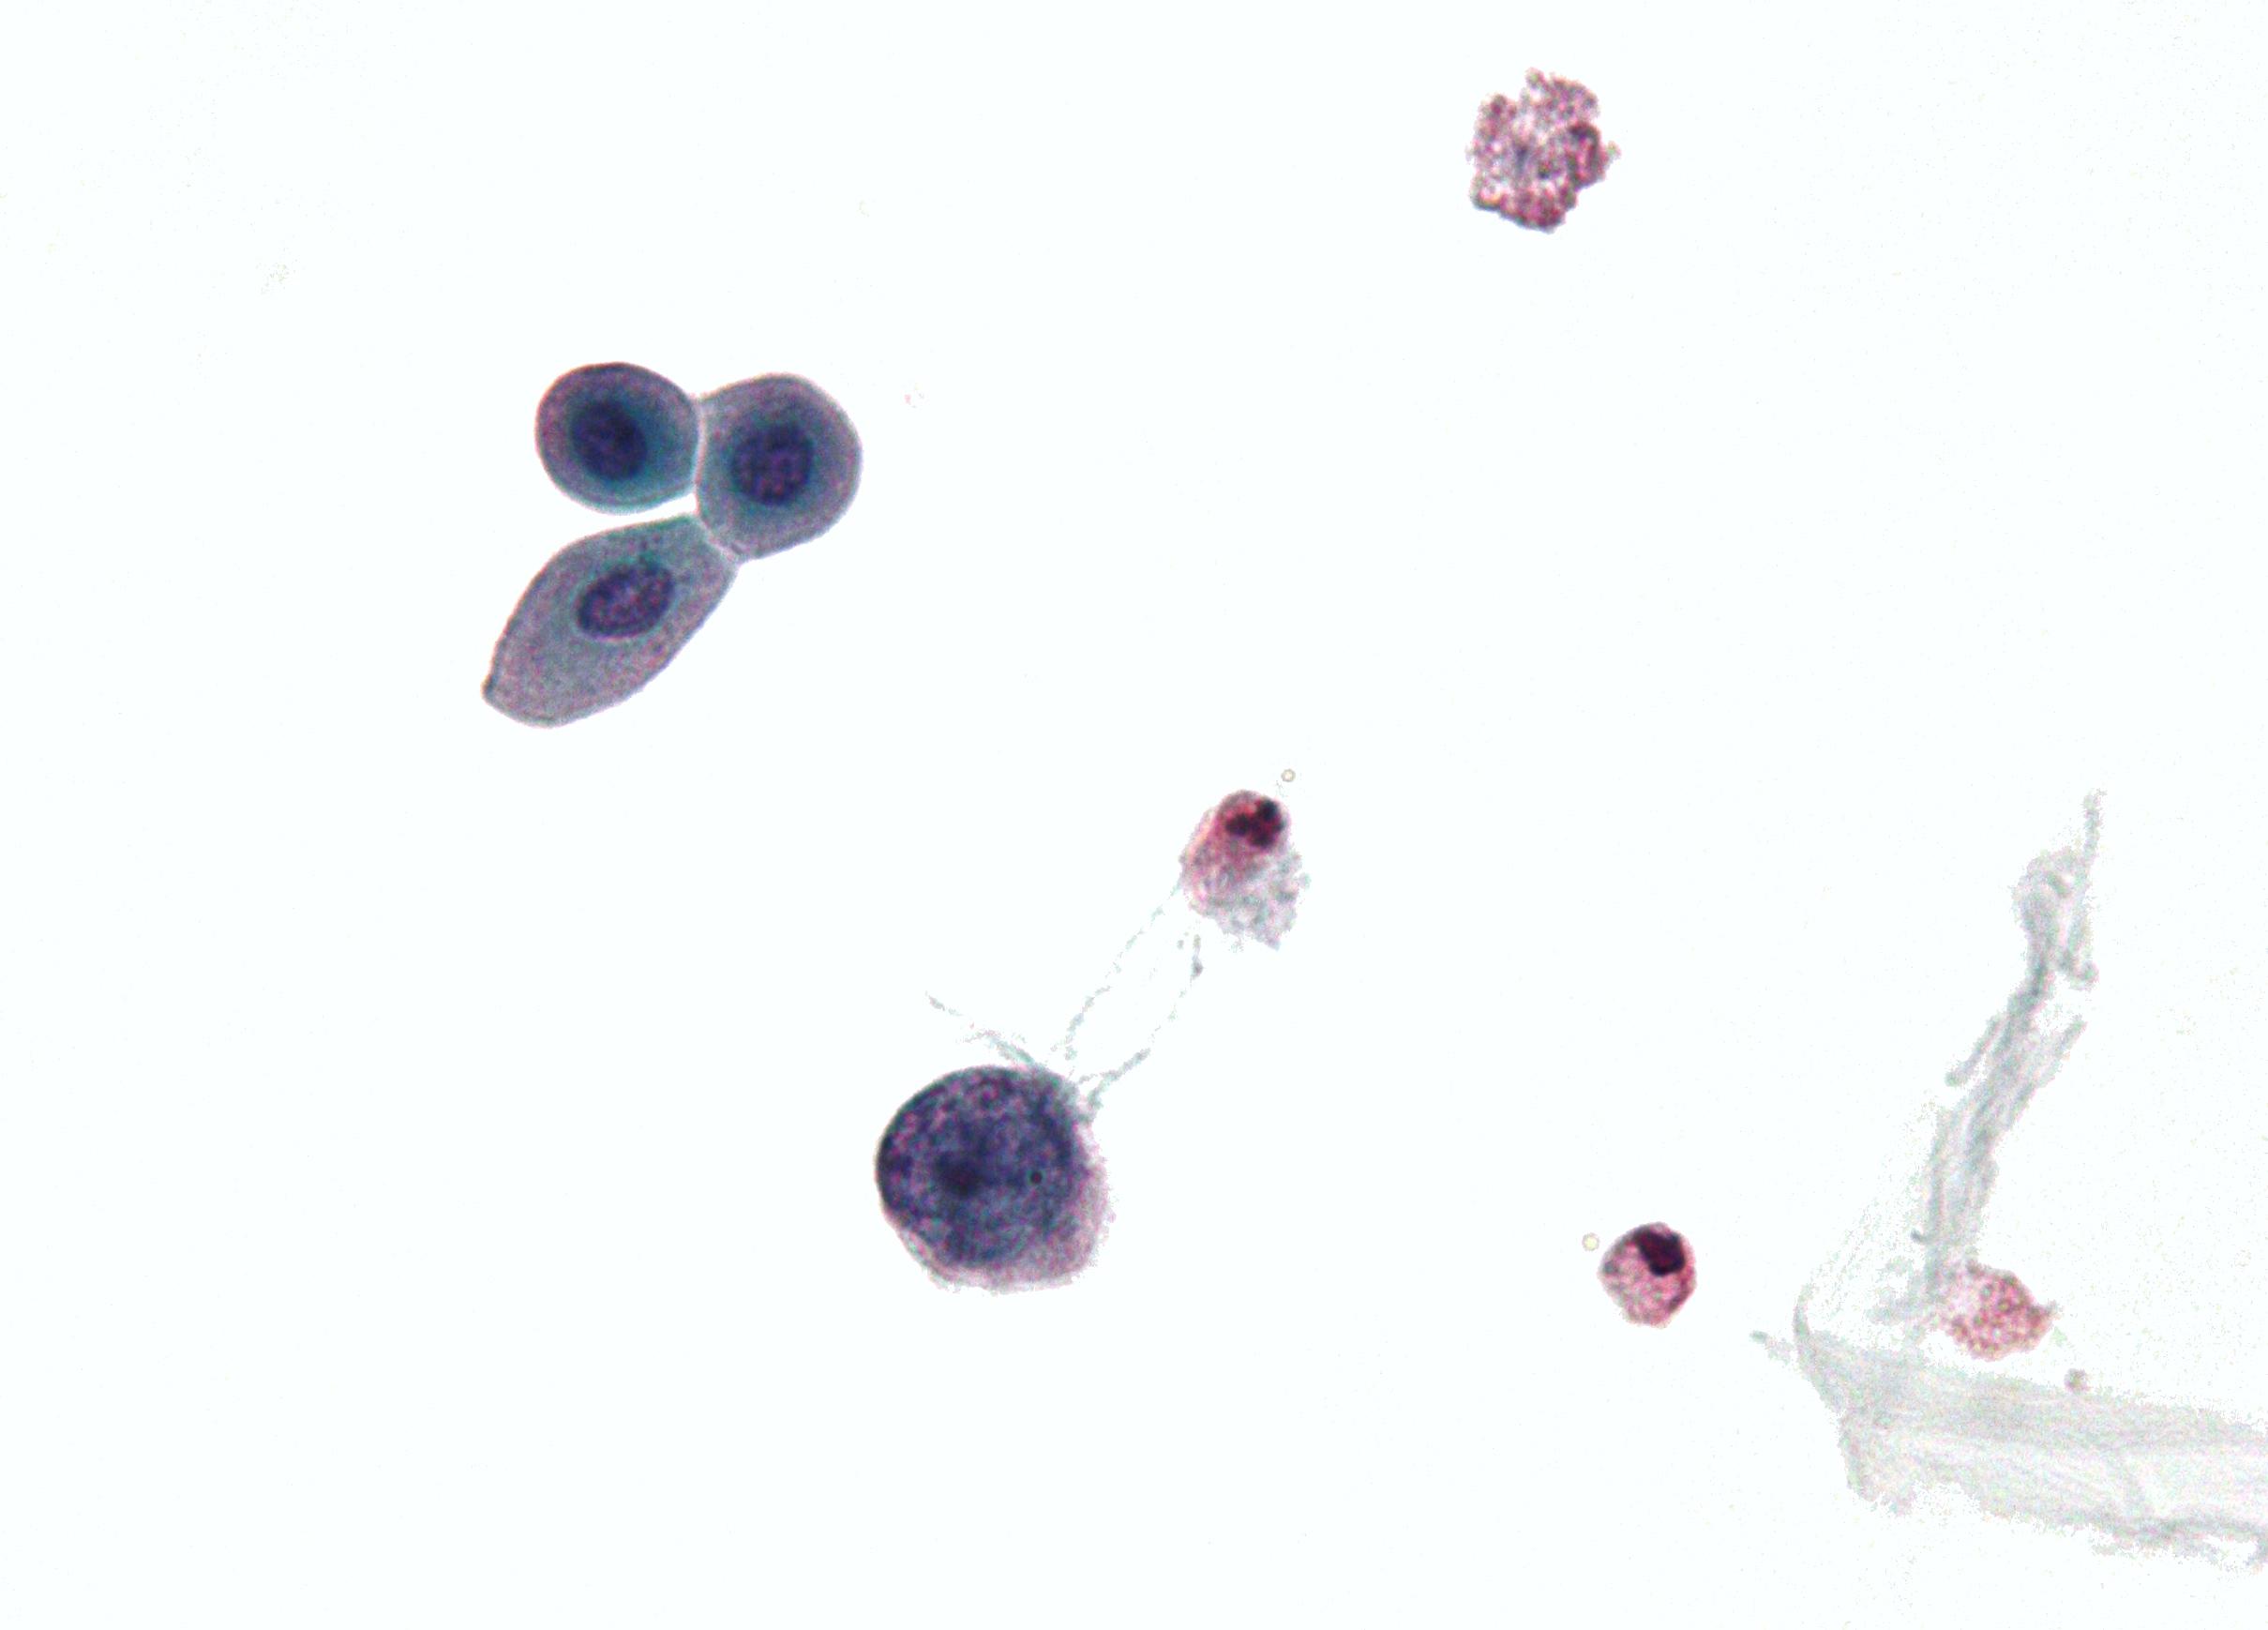 Poate fi prostatita papilomavirus uman